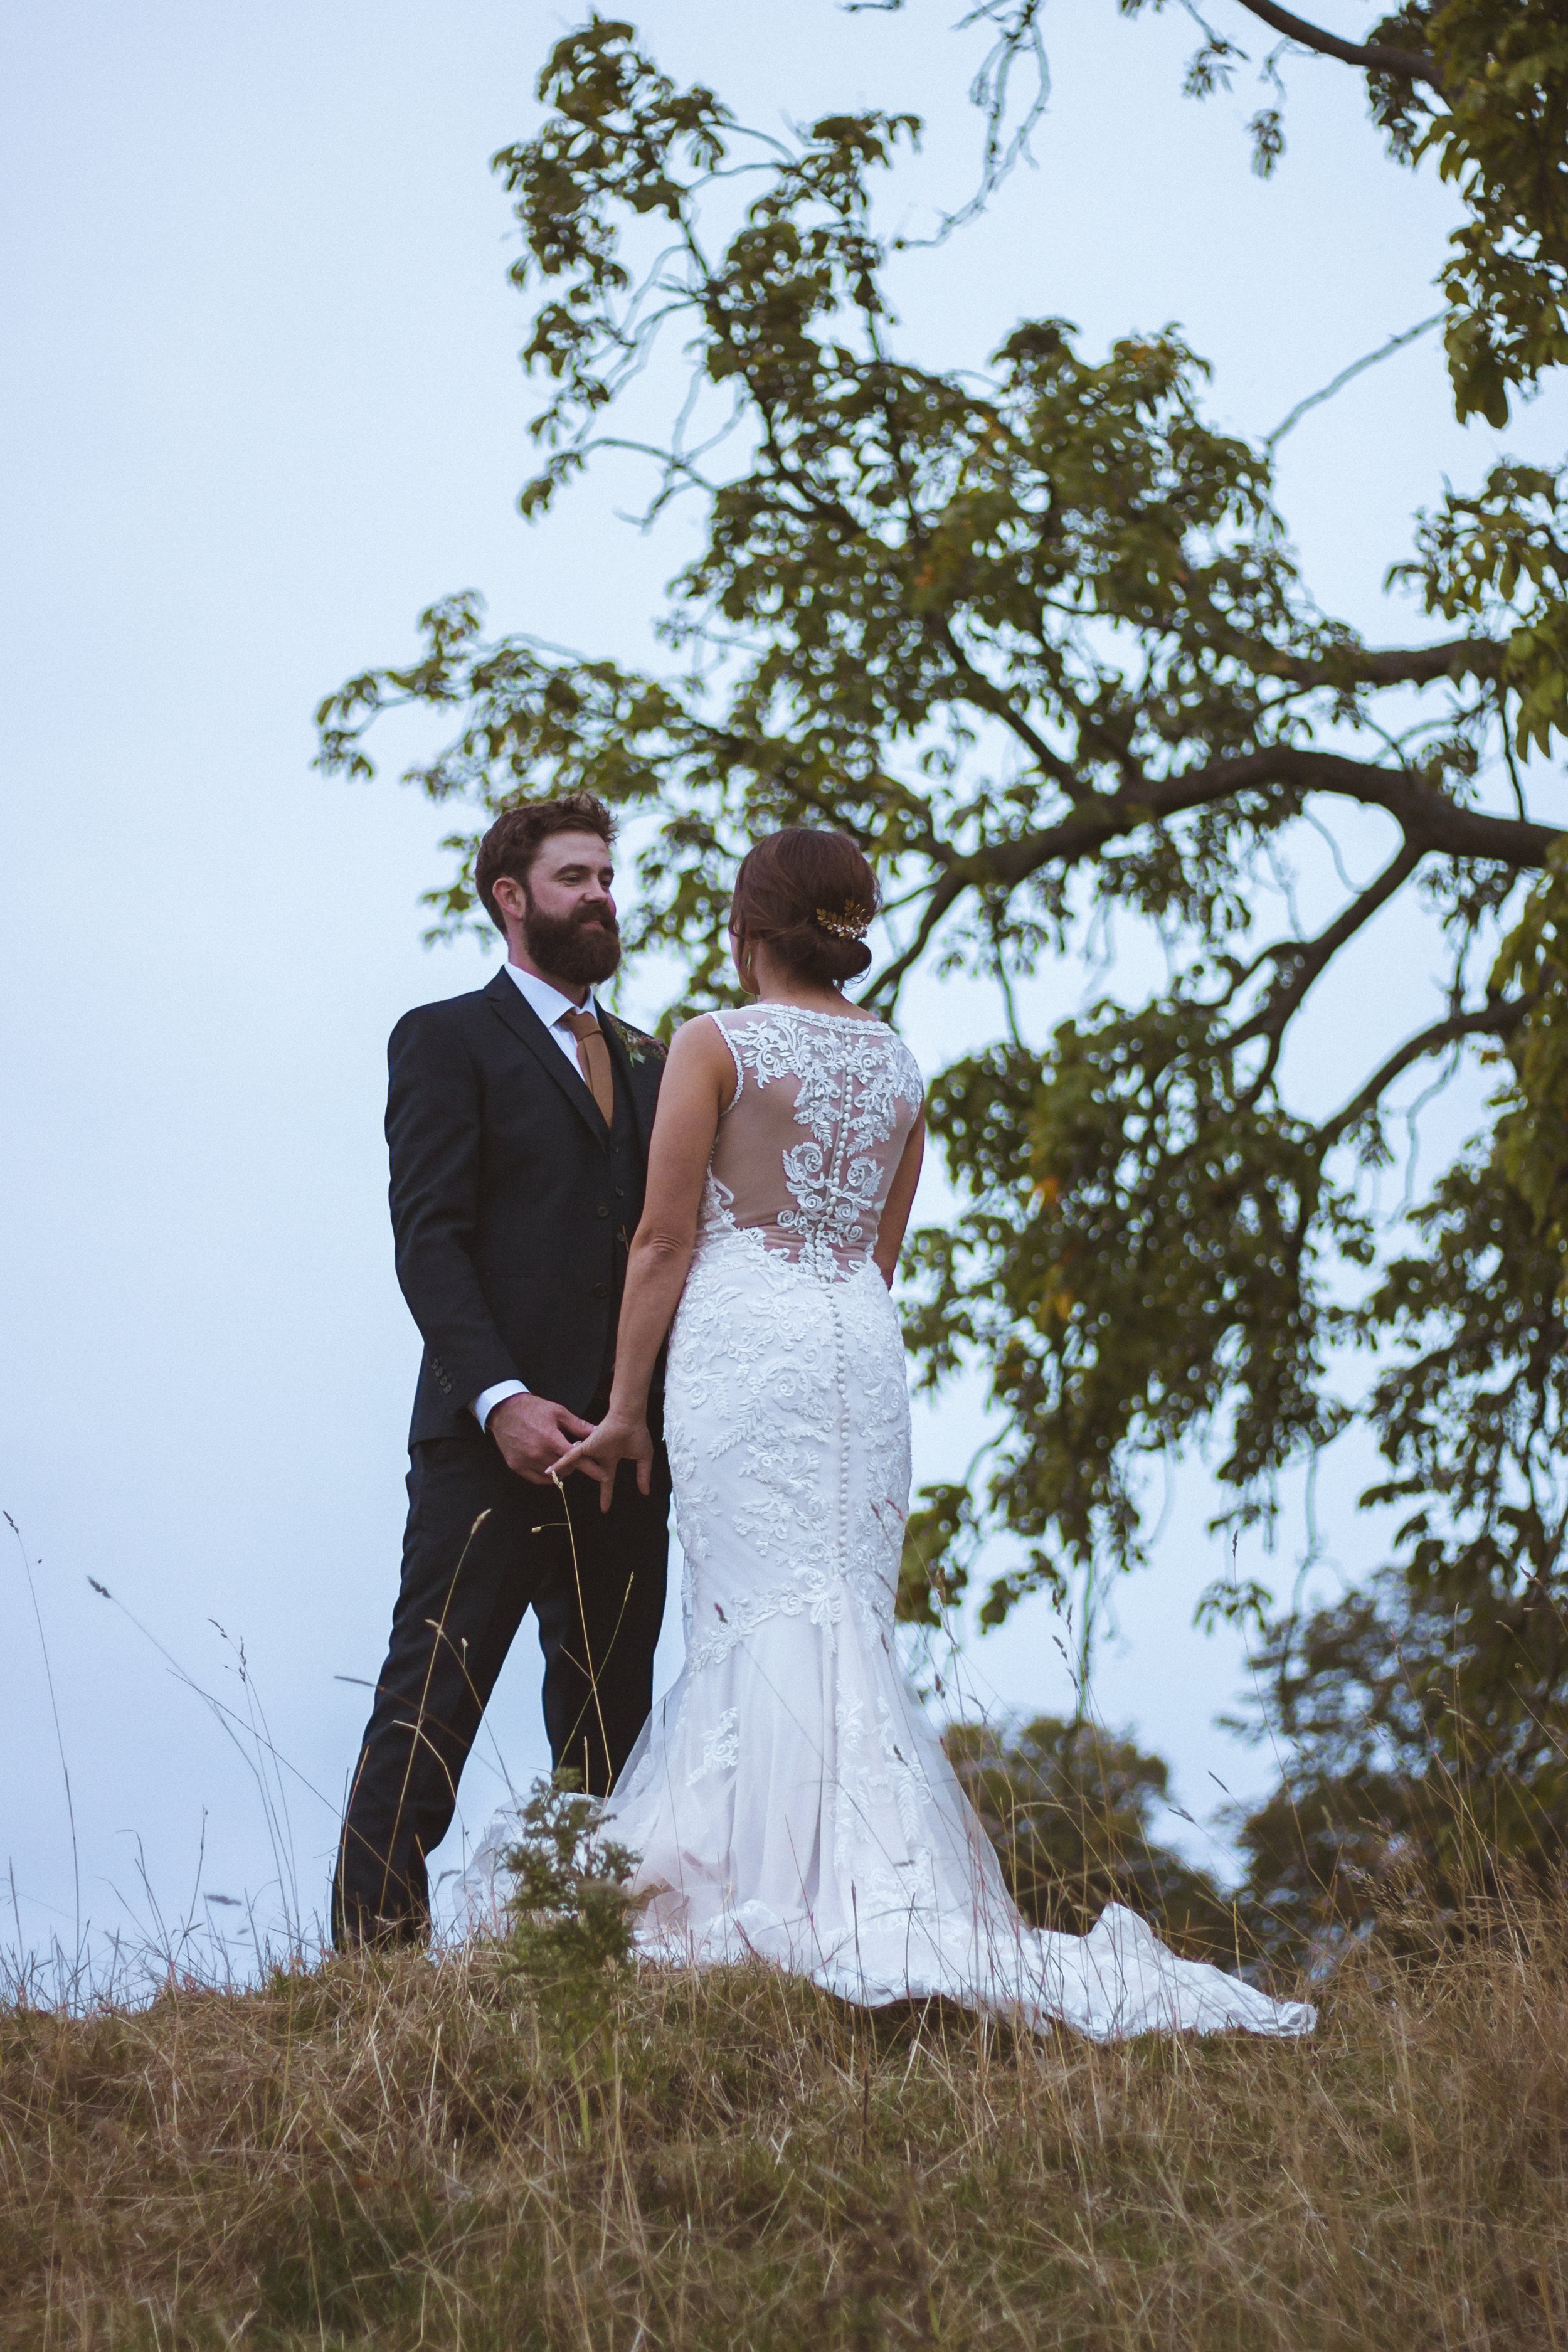 Greer & Tim's Wedding 556.jpg